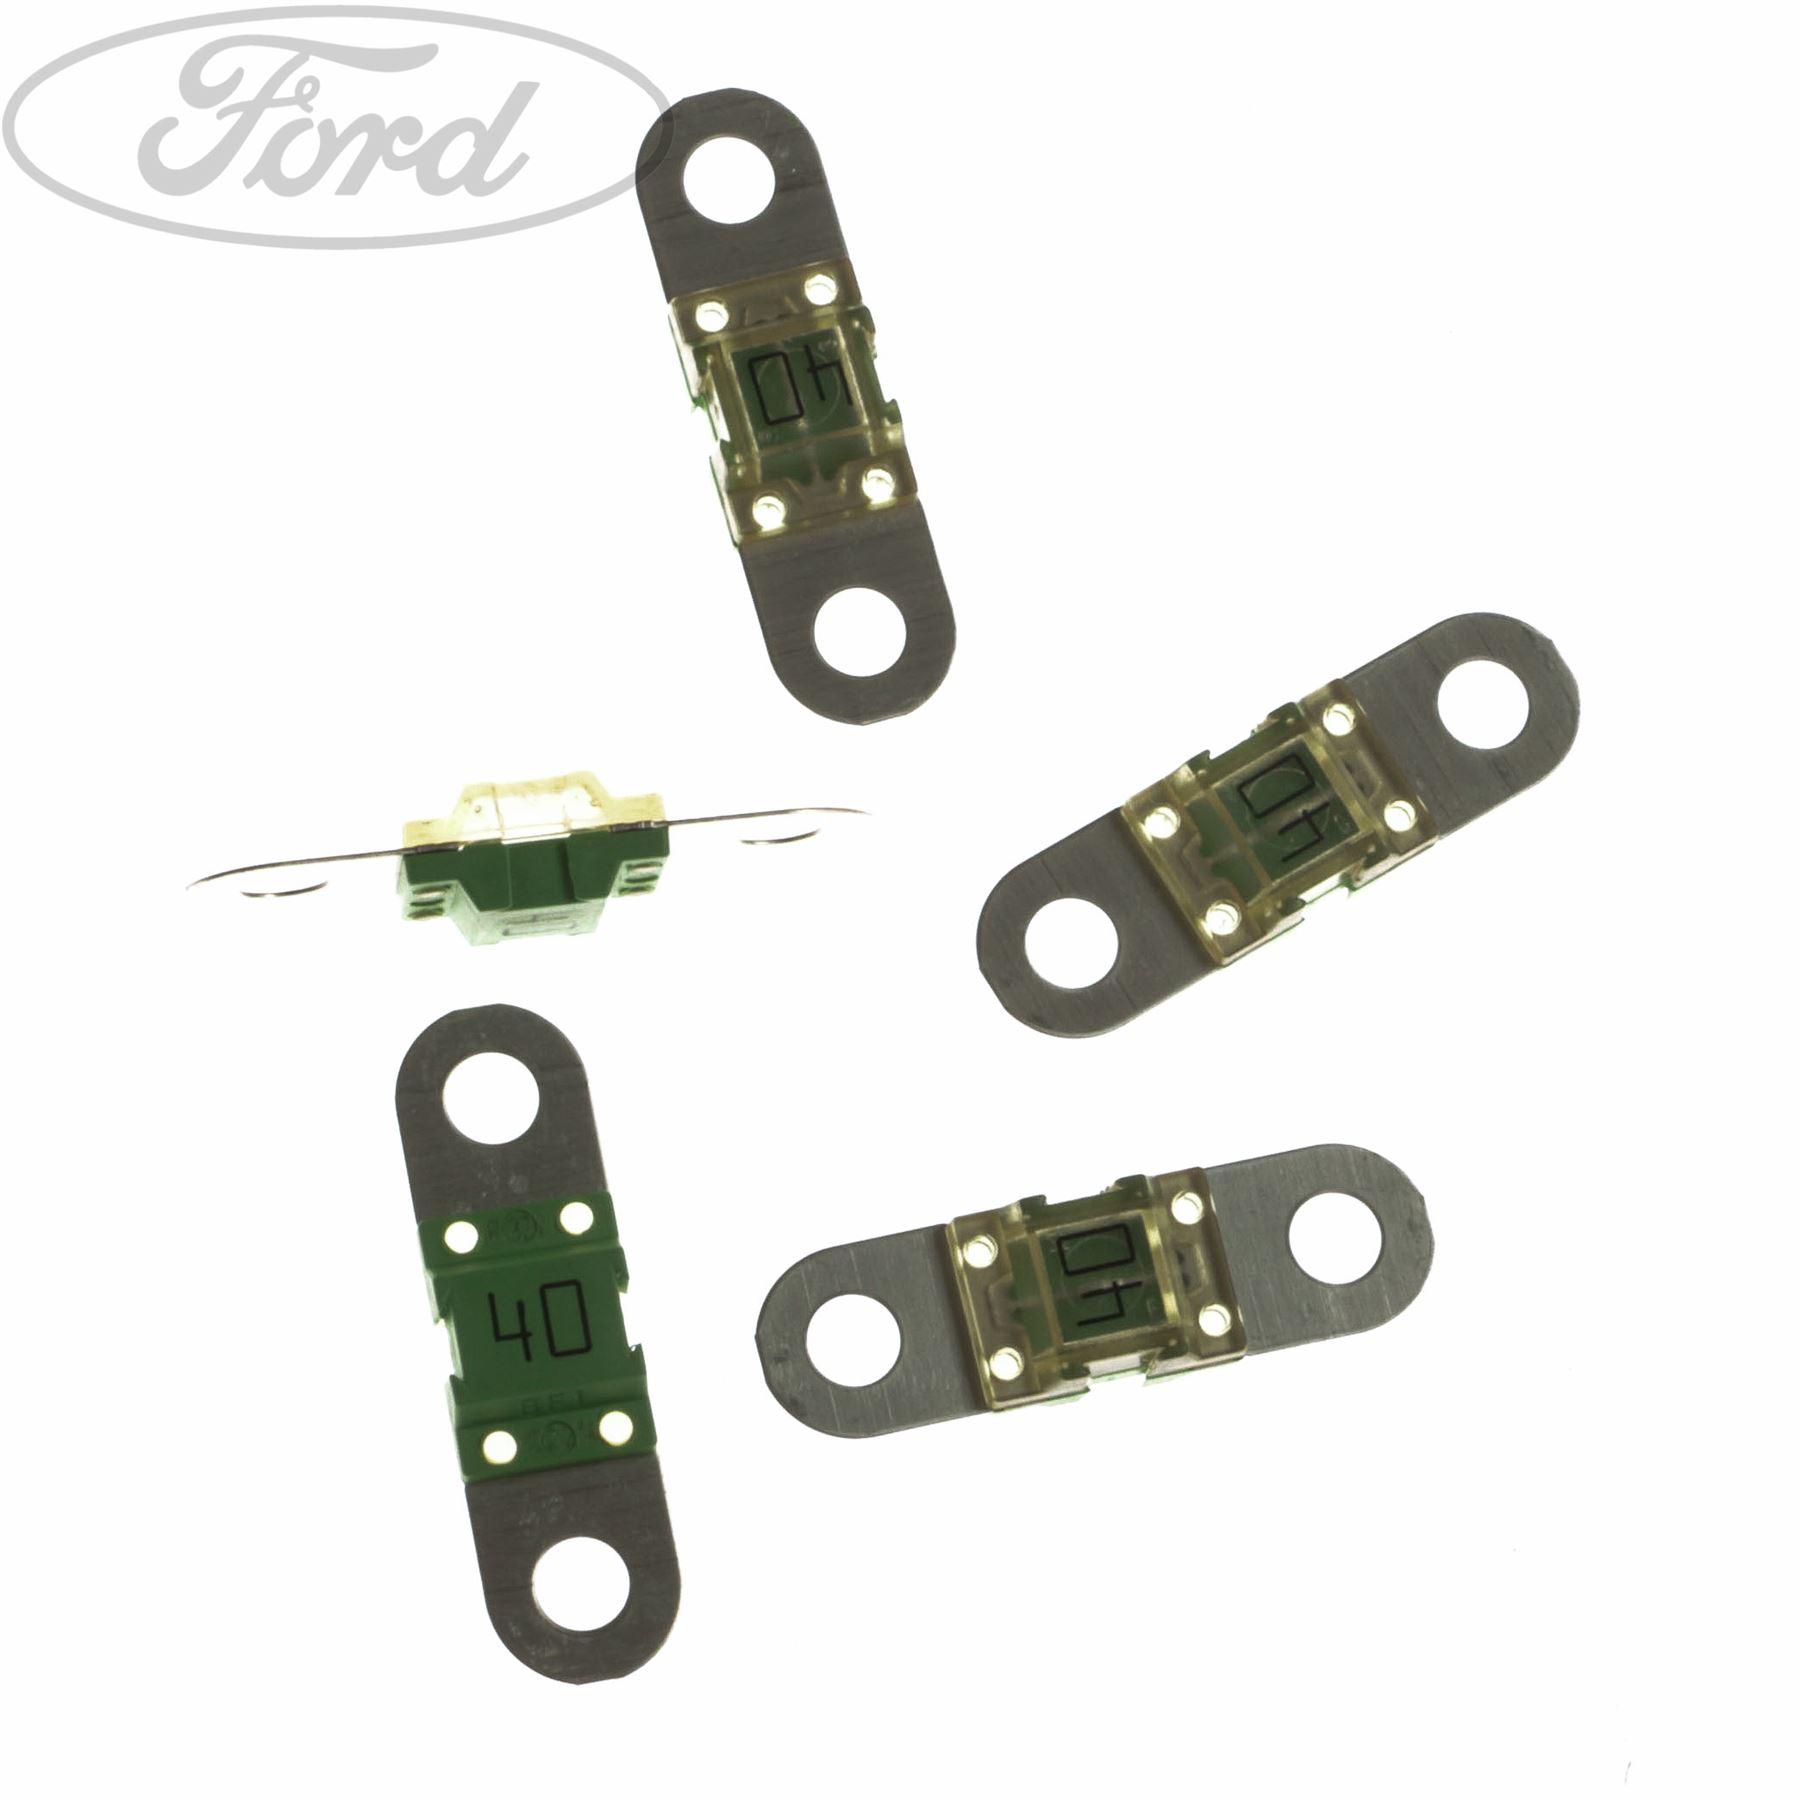 hight resolution of details about genuine ford focus mk3 focus mk2 transit mk7 fiesta circuit breaker 1148212